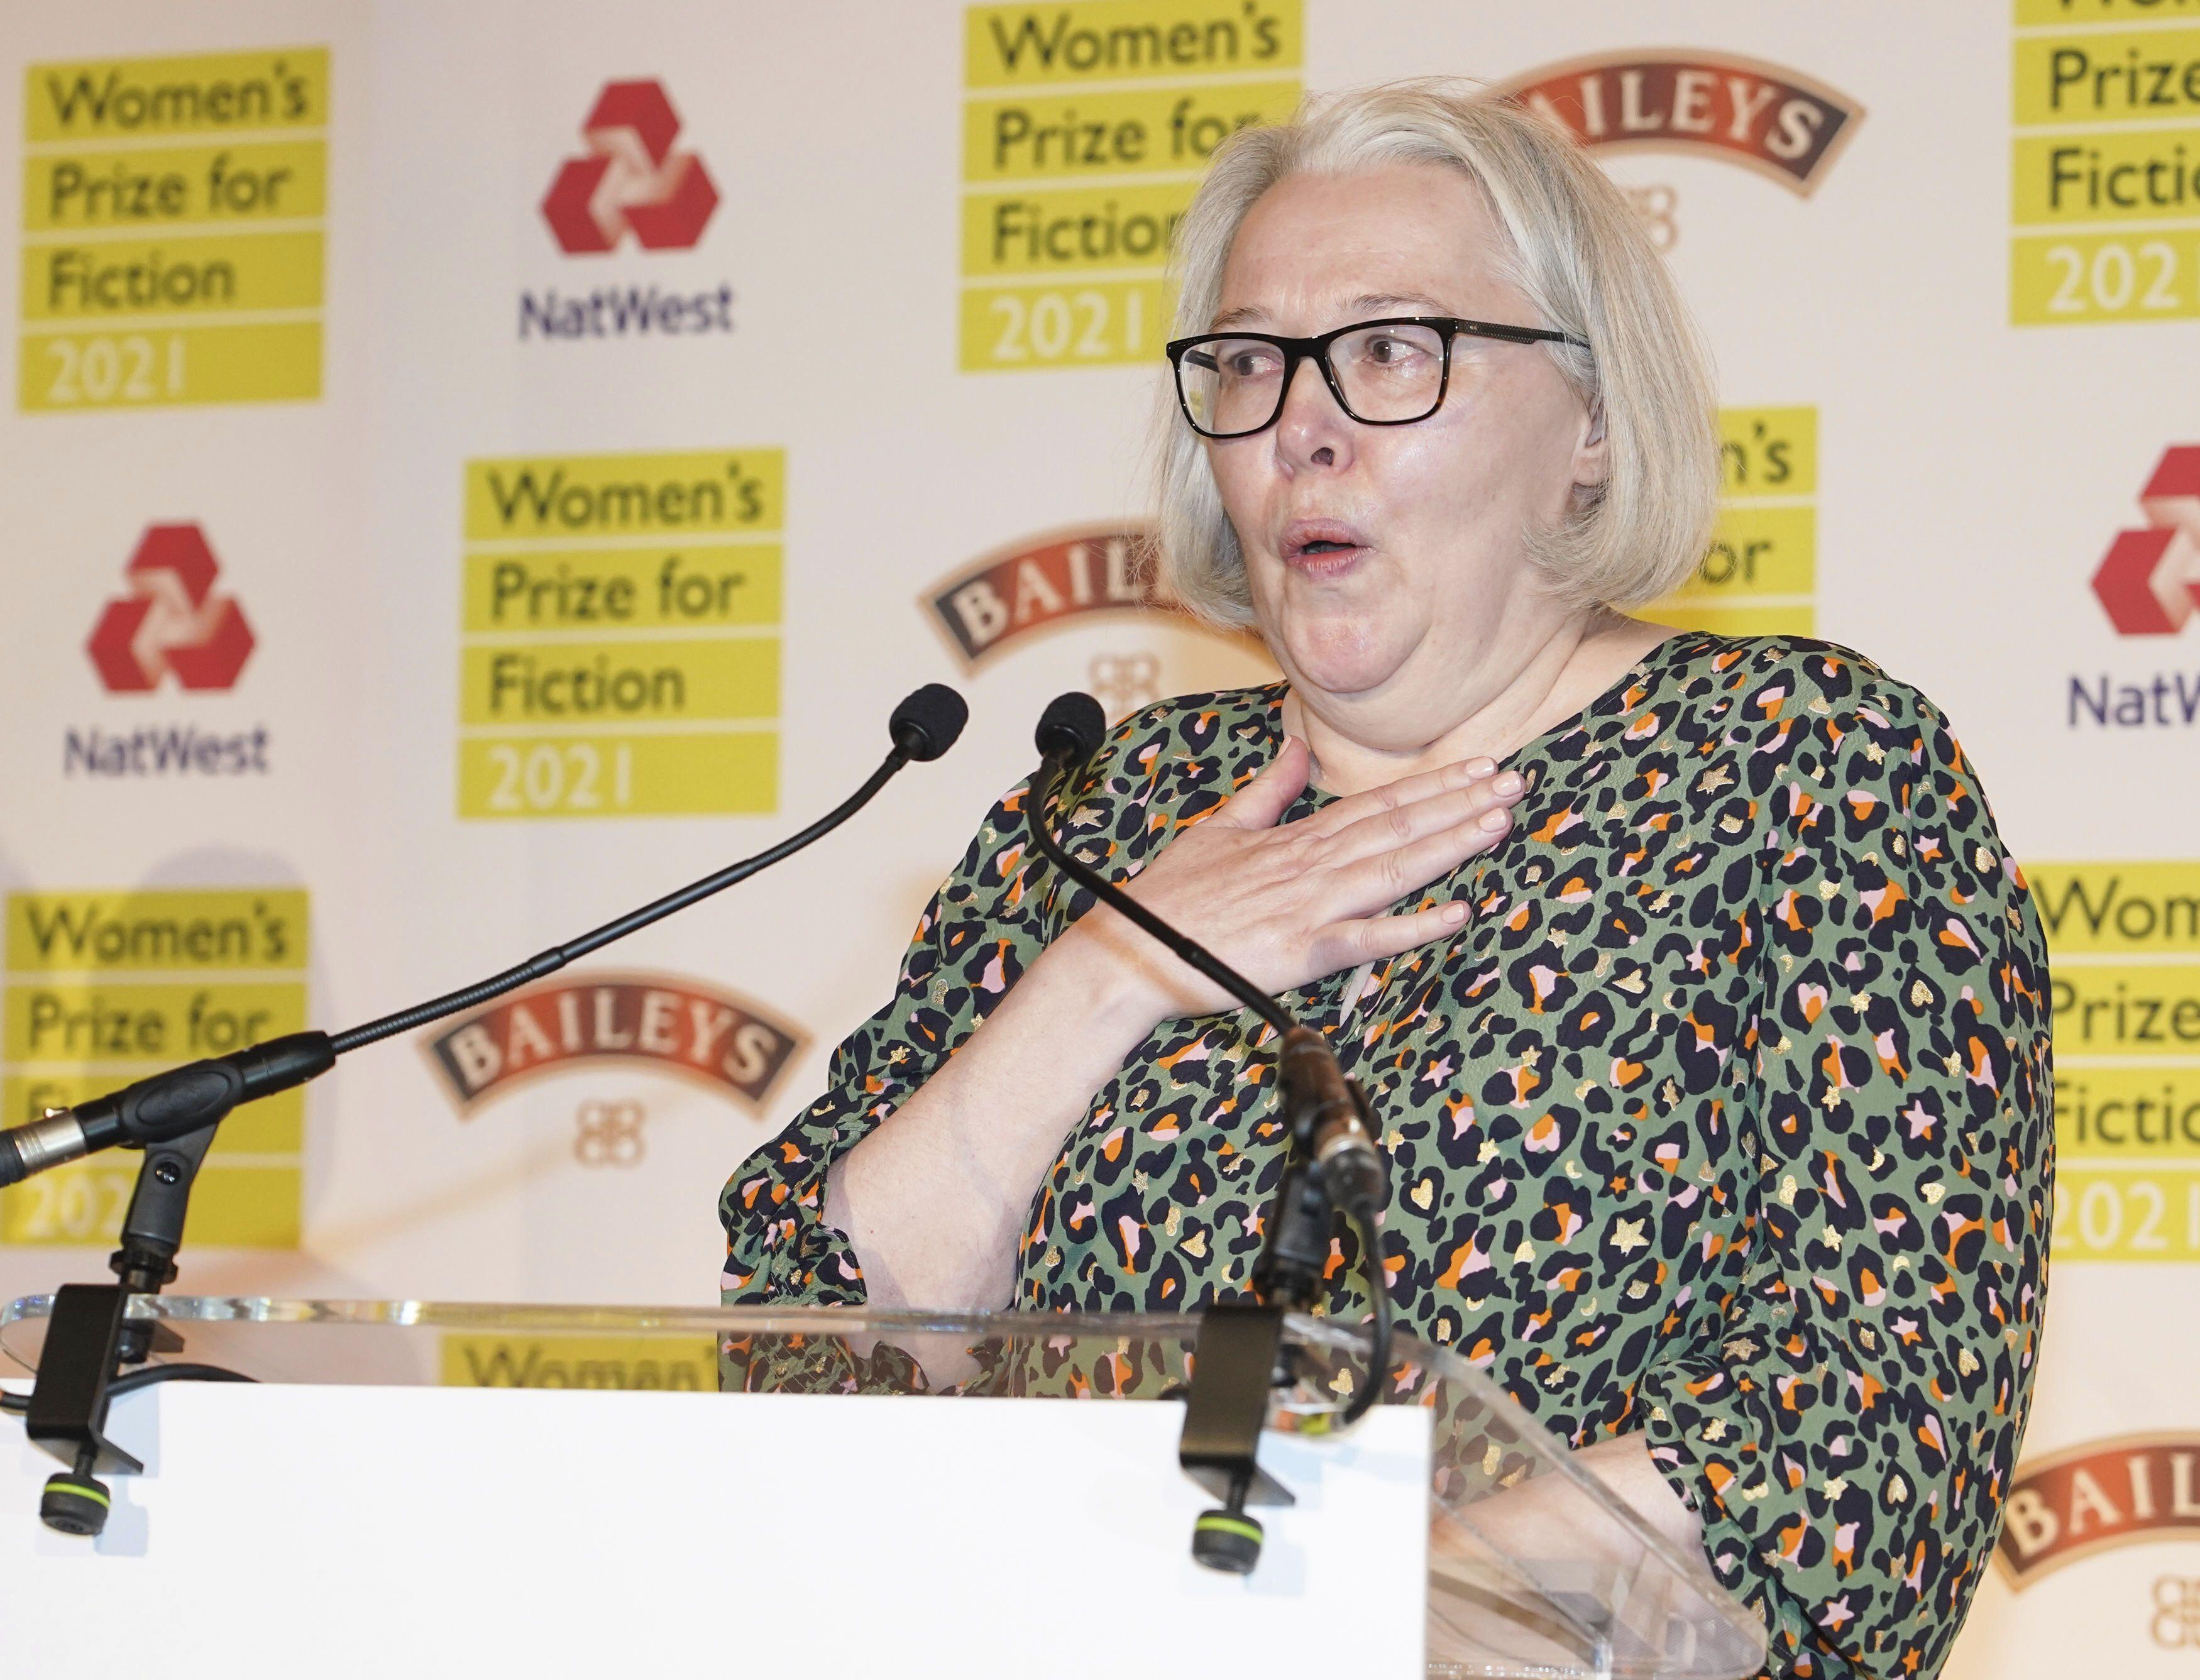 novelista susanna clarke gana premio femenino de ficcion